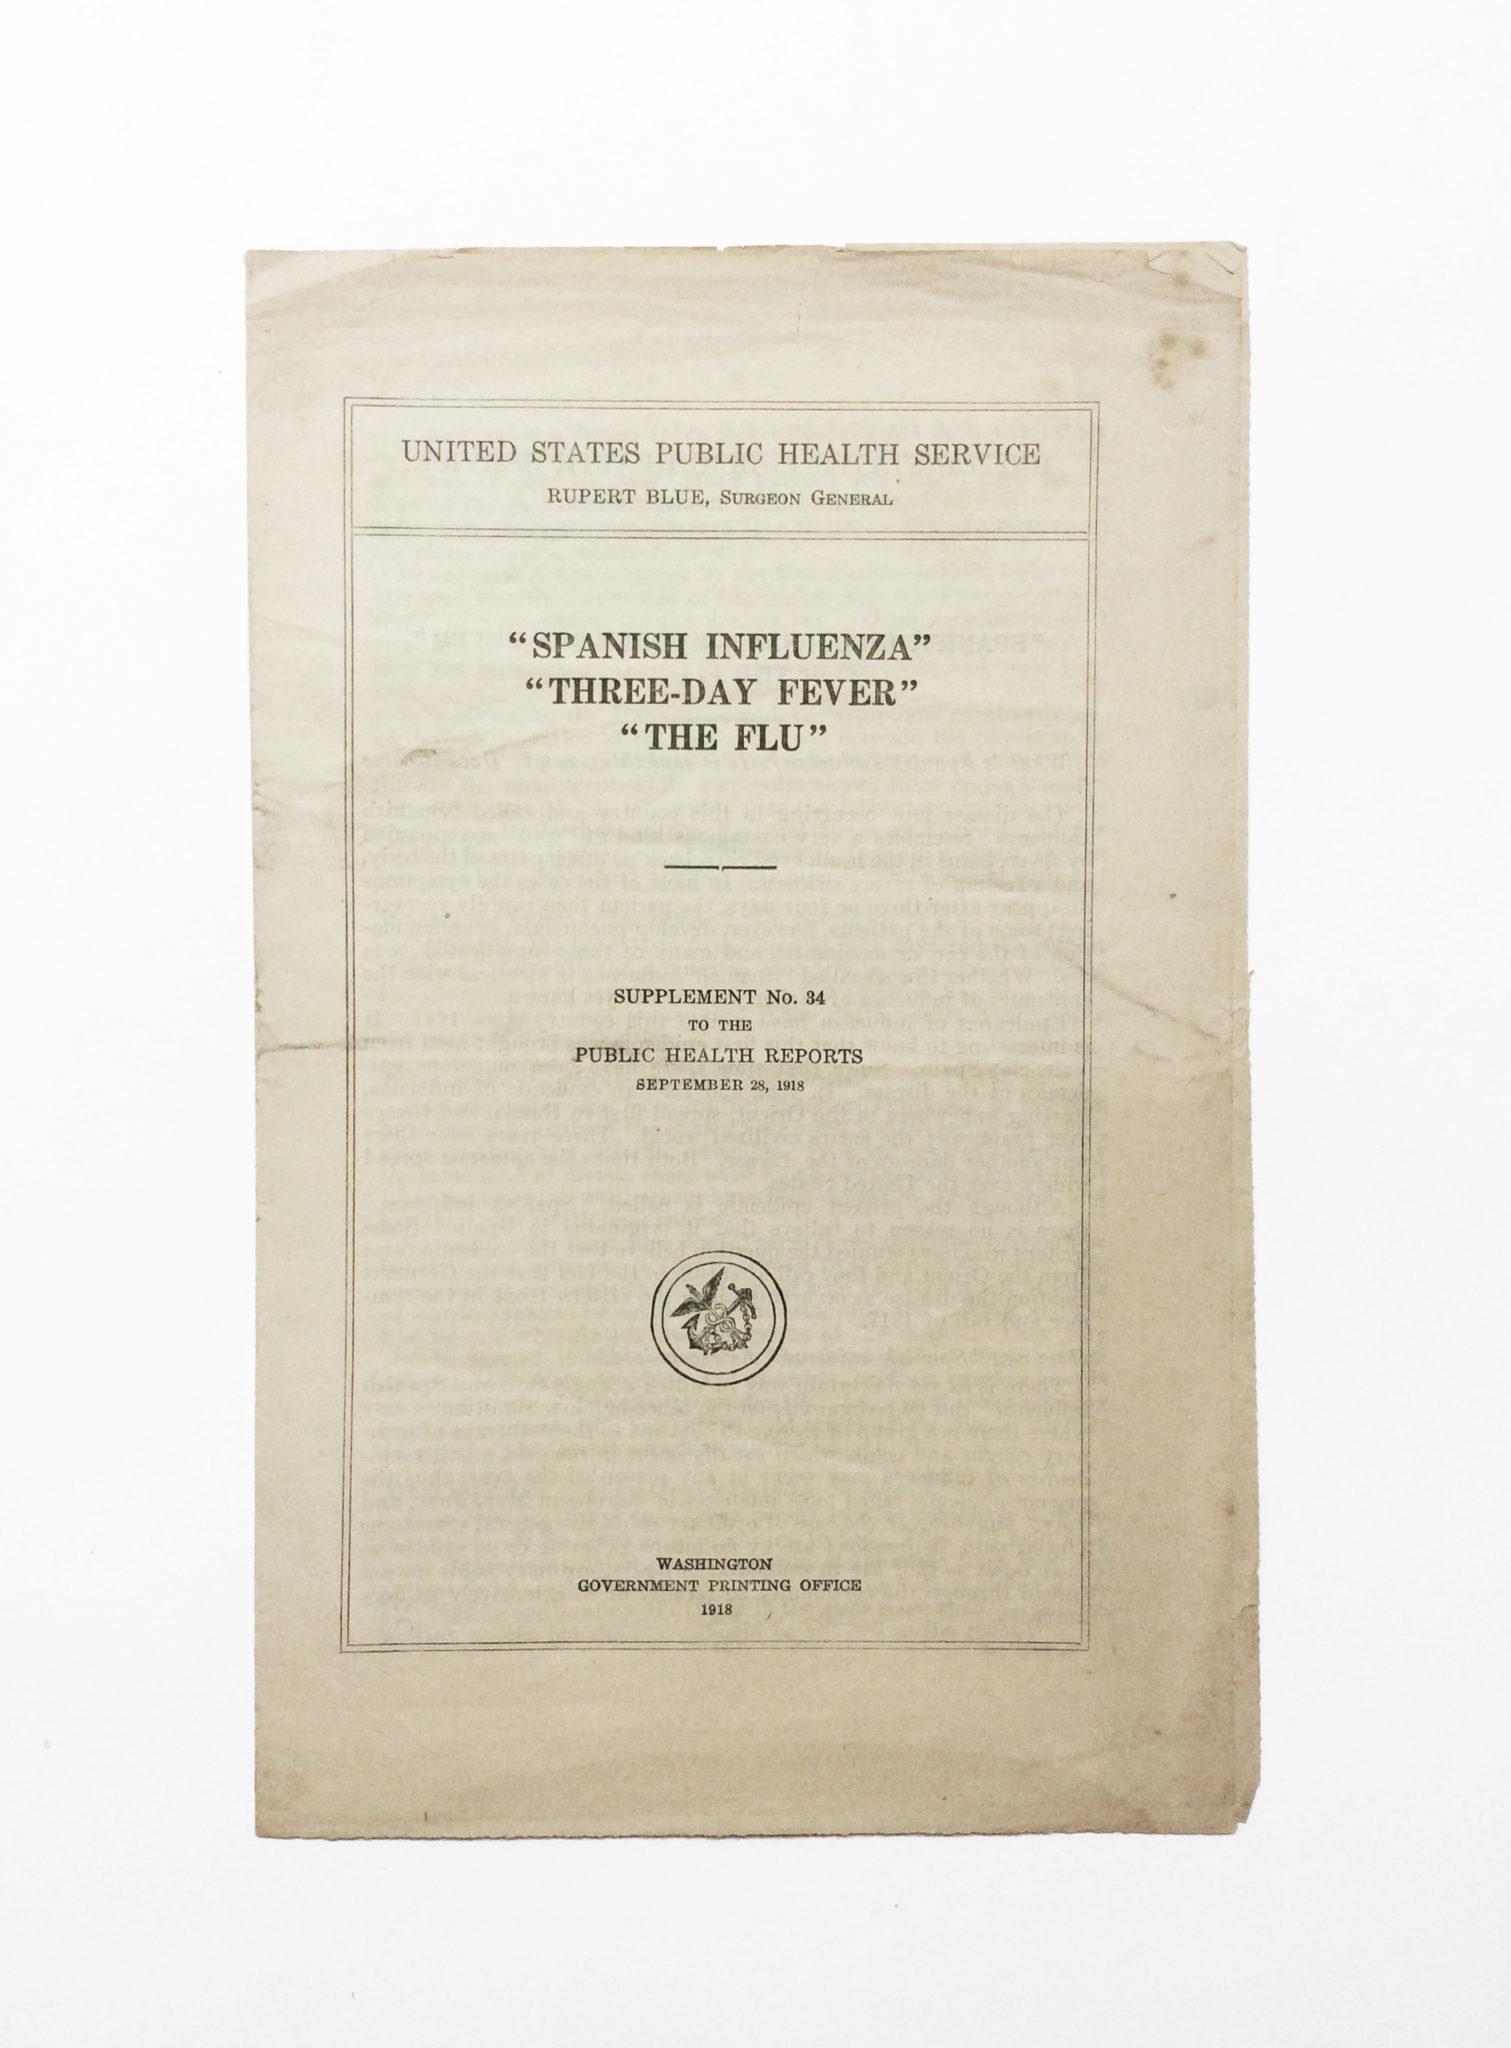 Social distancing in 1918: rare Spanish Flu ephemera